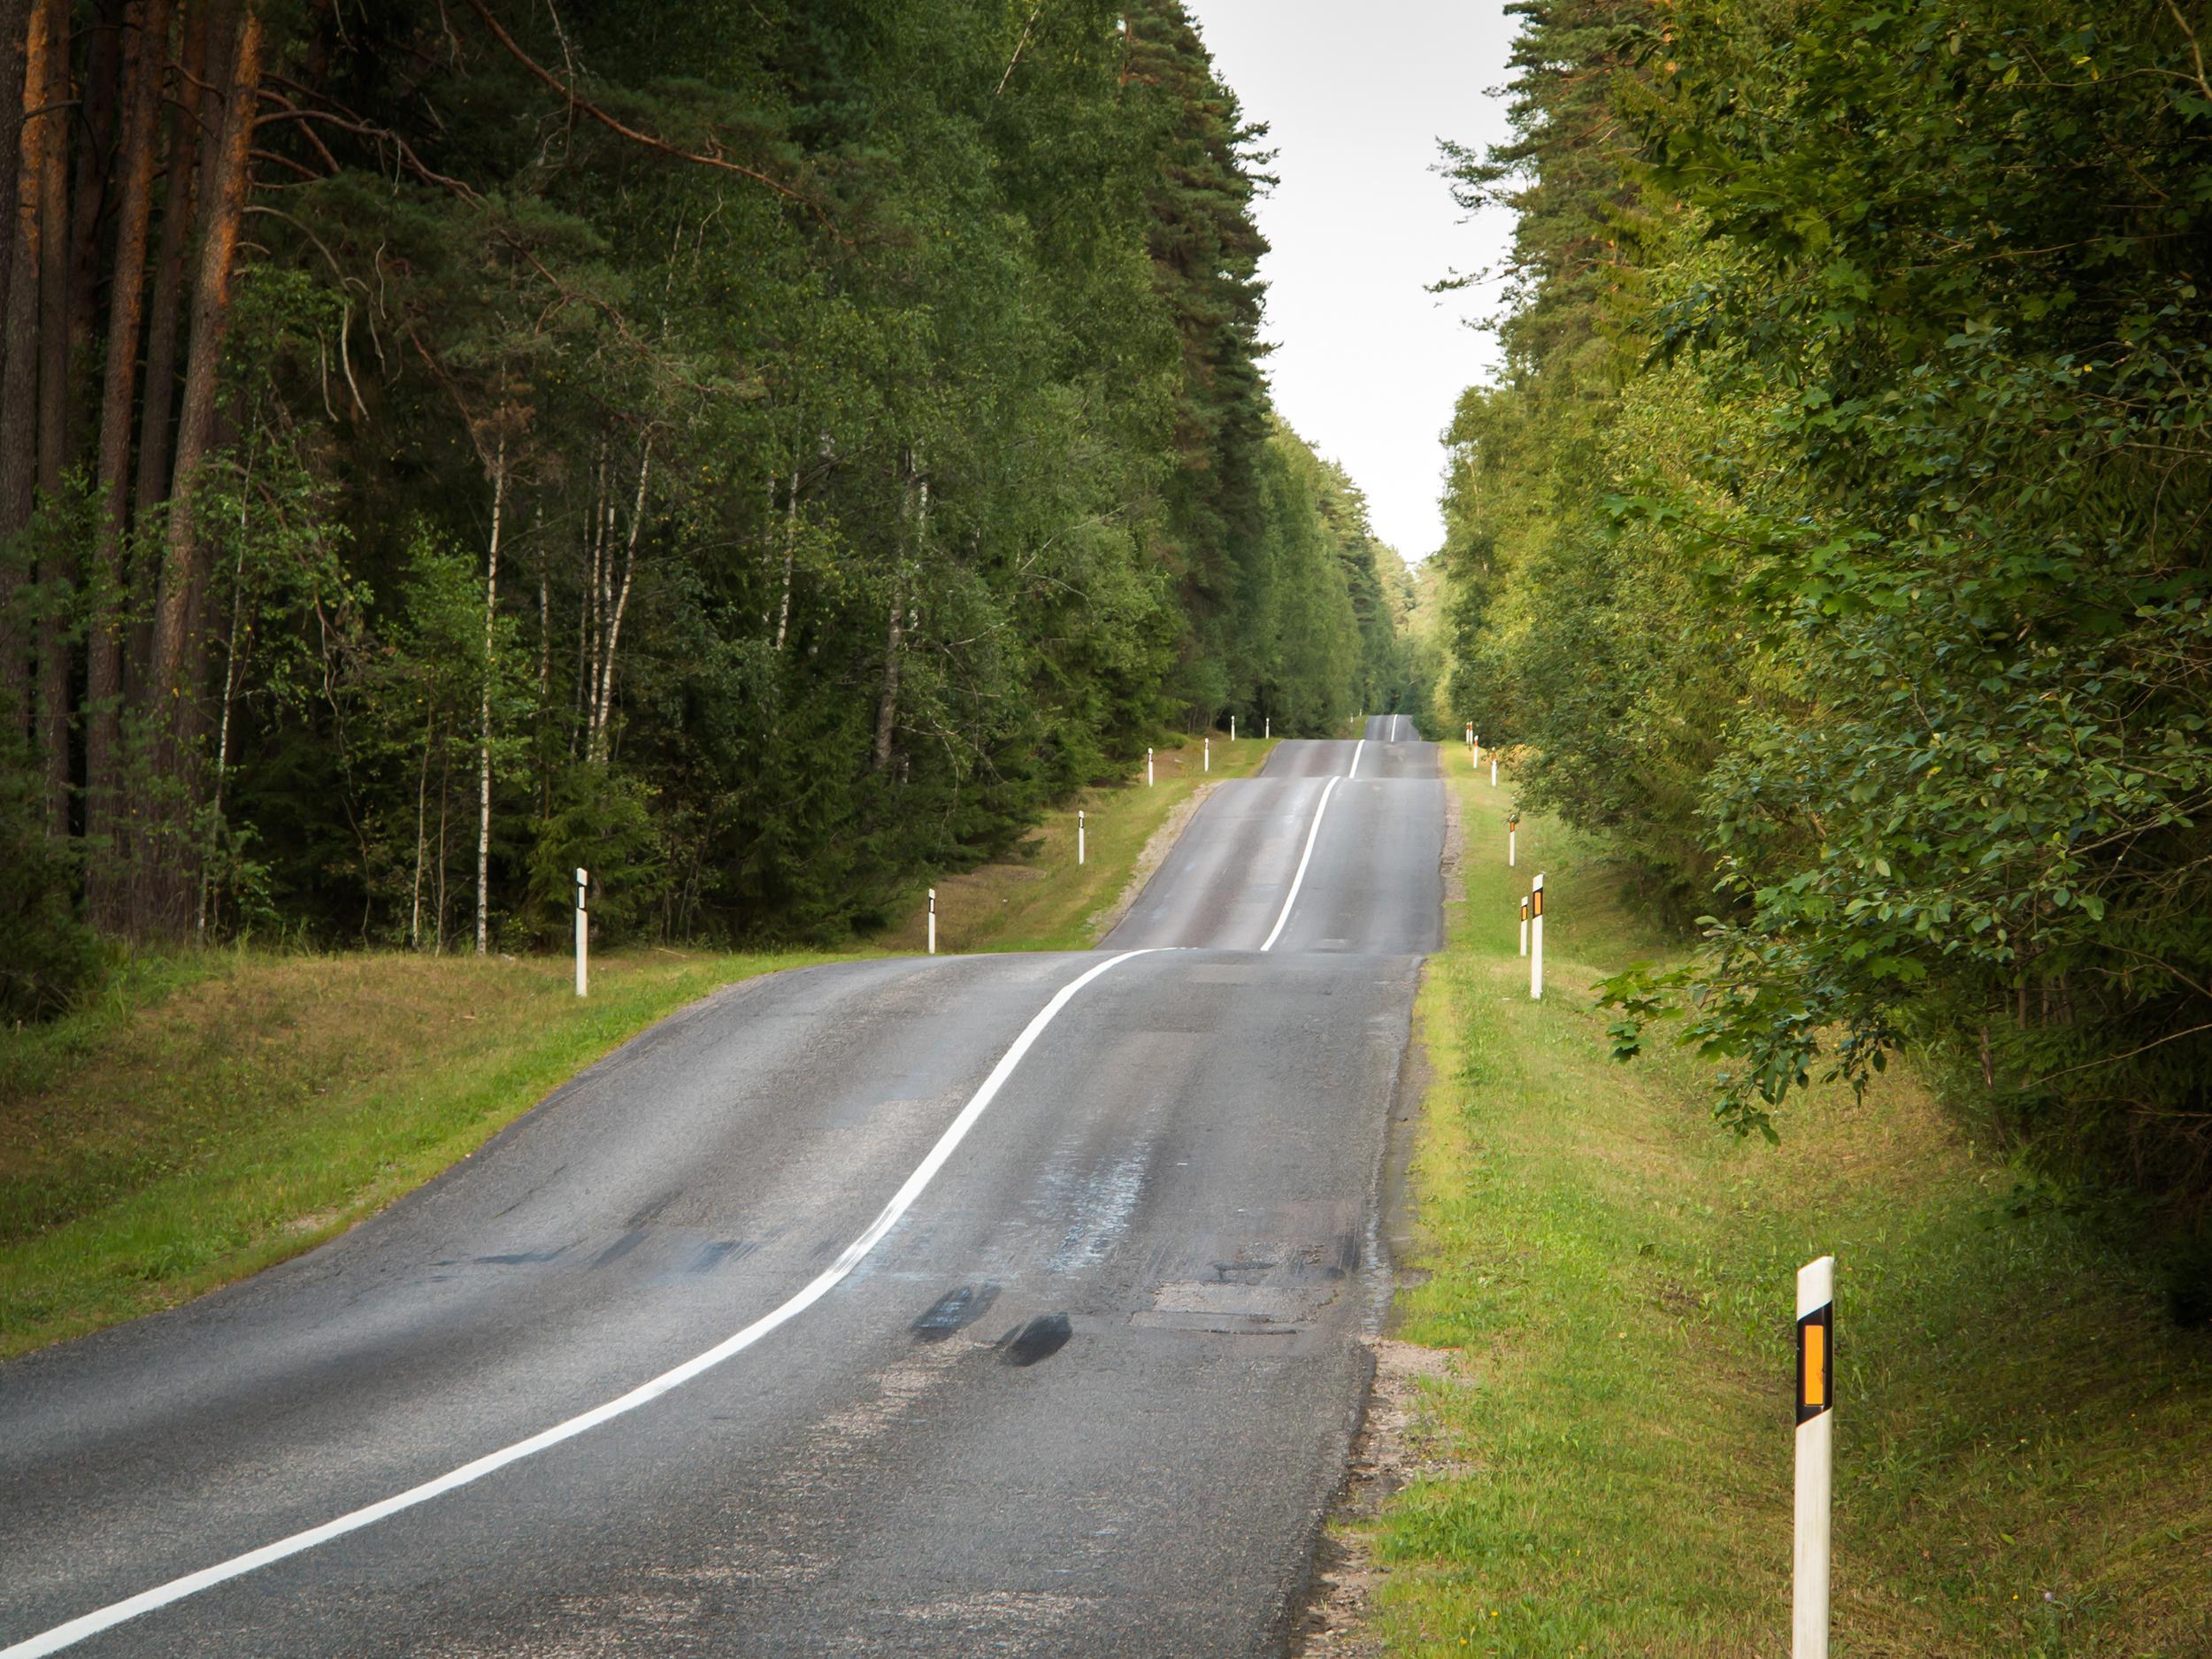 The Bumpy Road to 10% Thumbnail